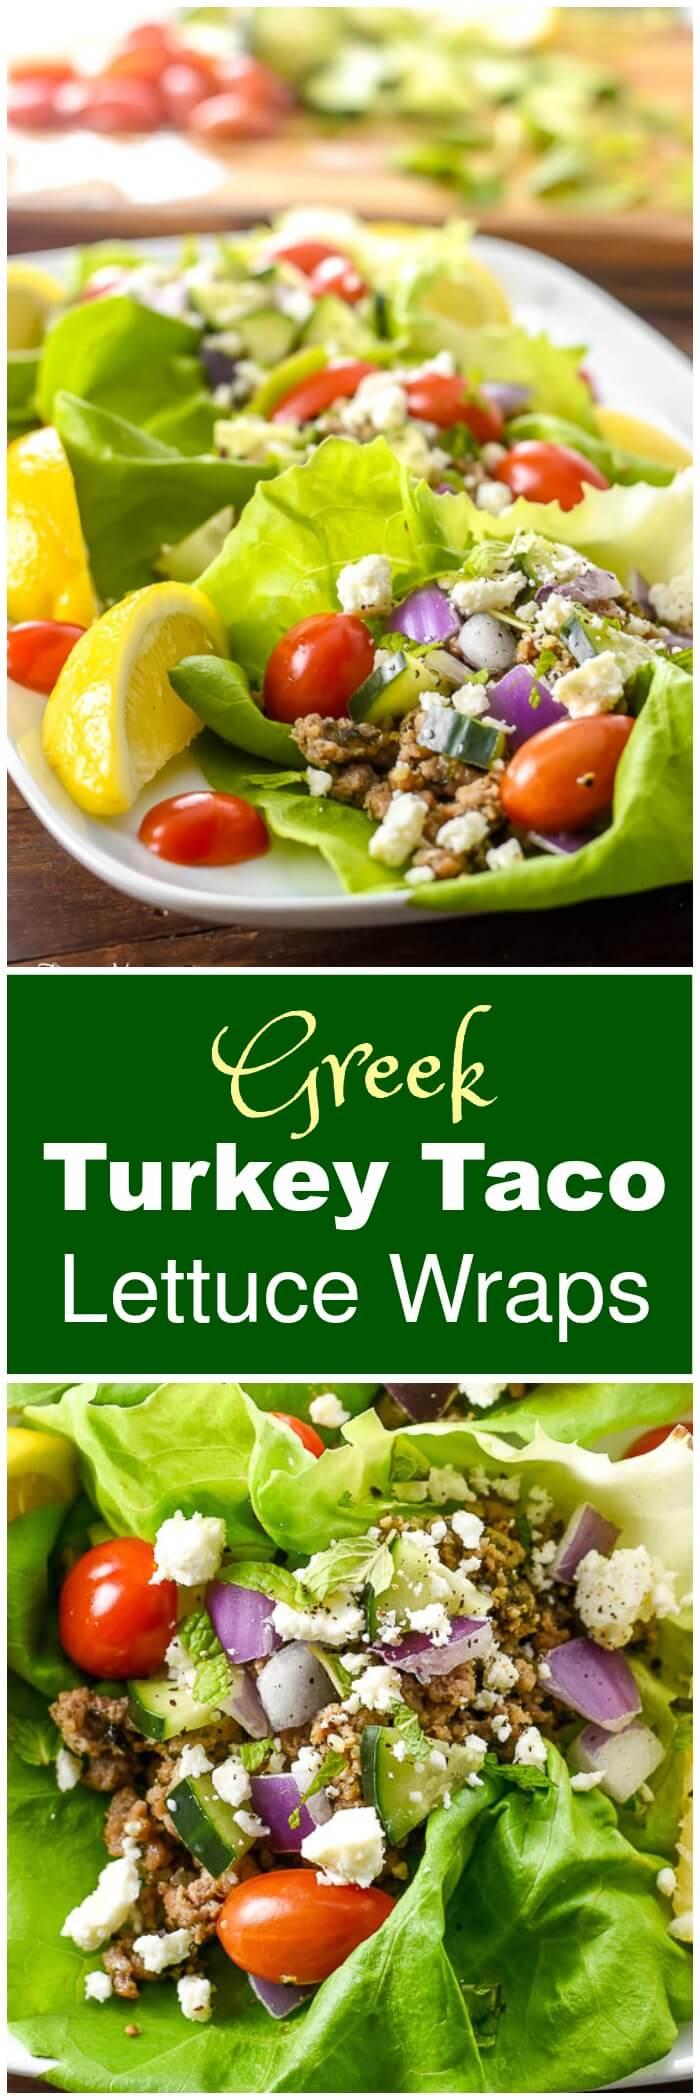 Greek Turkey Taco Lettuce Wraps by Flavor Mosaic